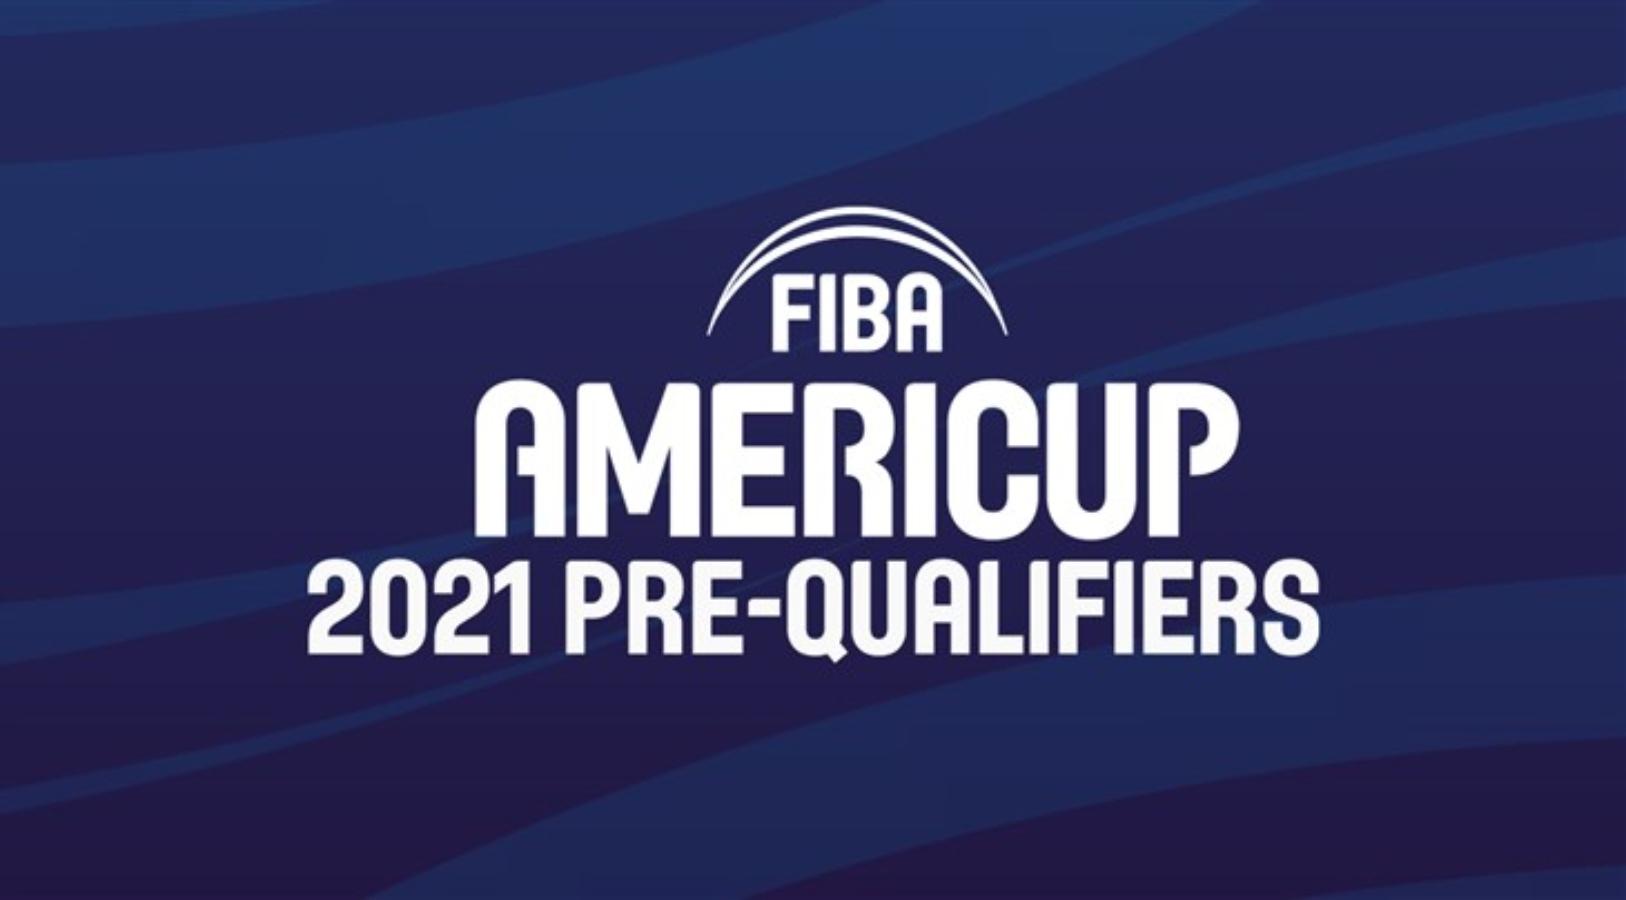 AmeriCup 2021